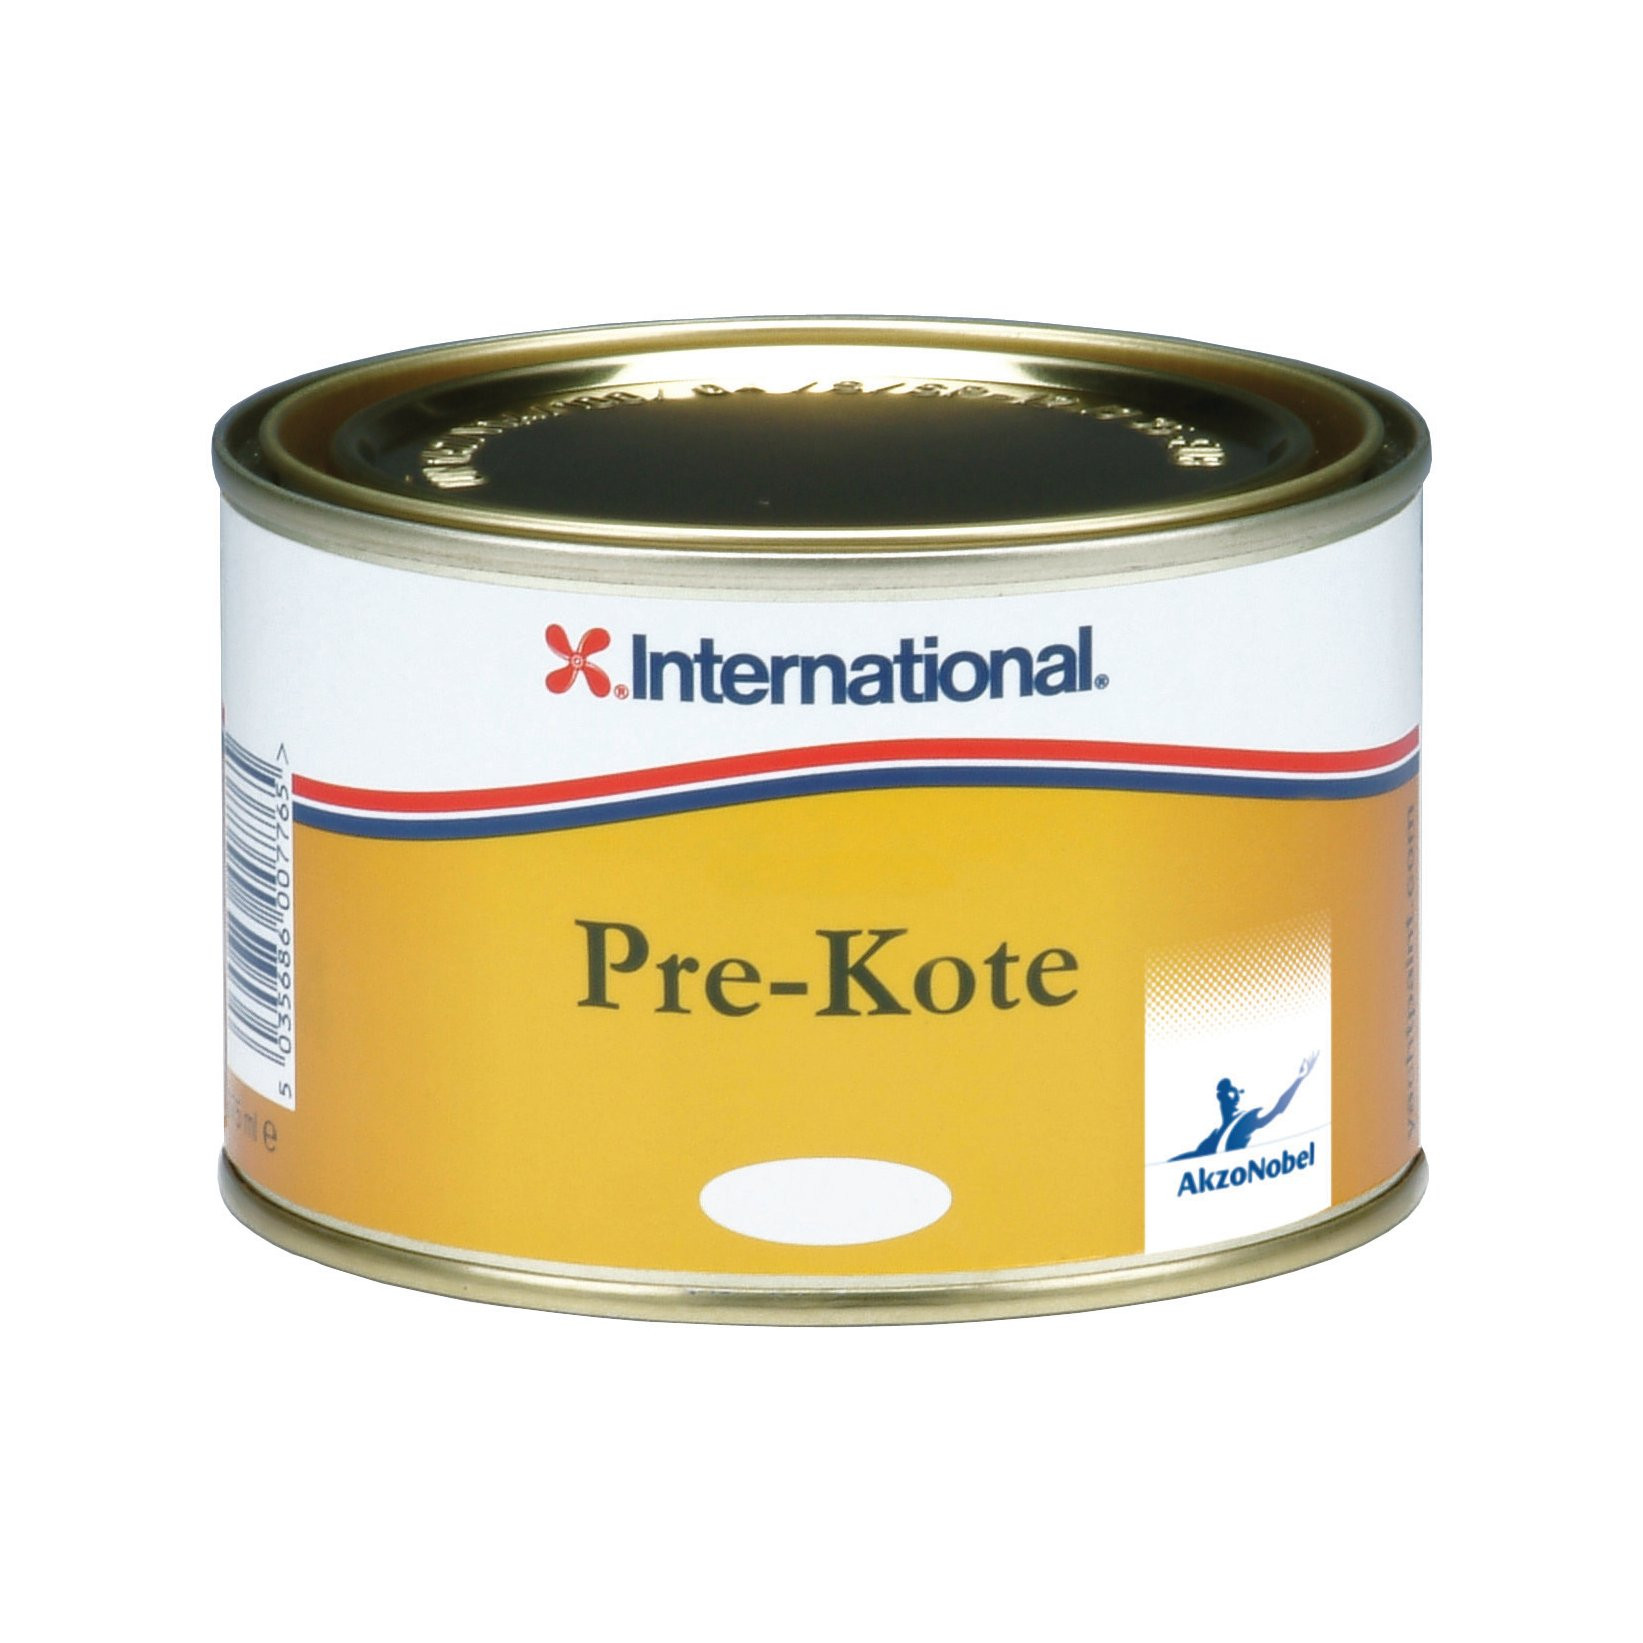 International Pre-Kote grondverf - wit 001, 375ml